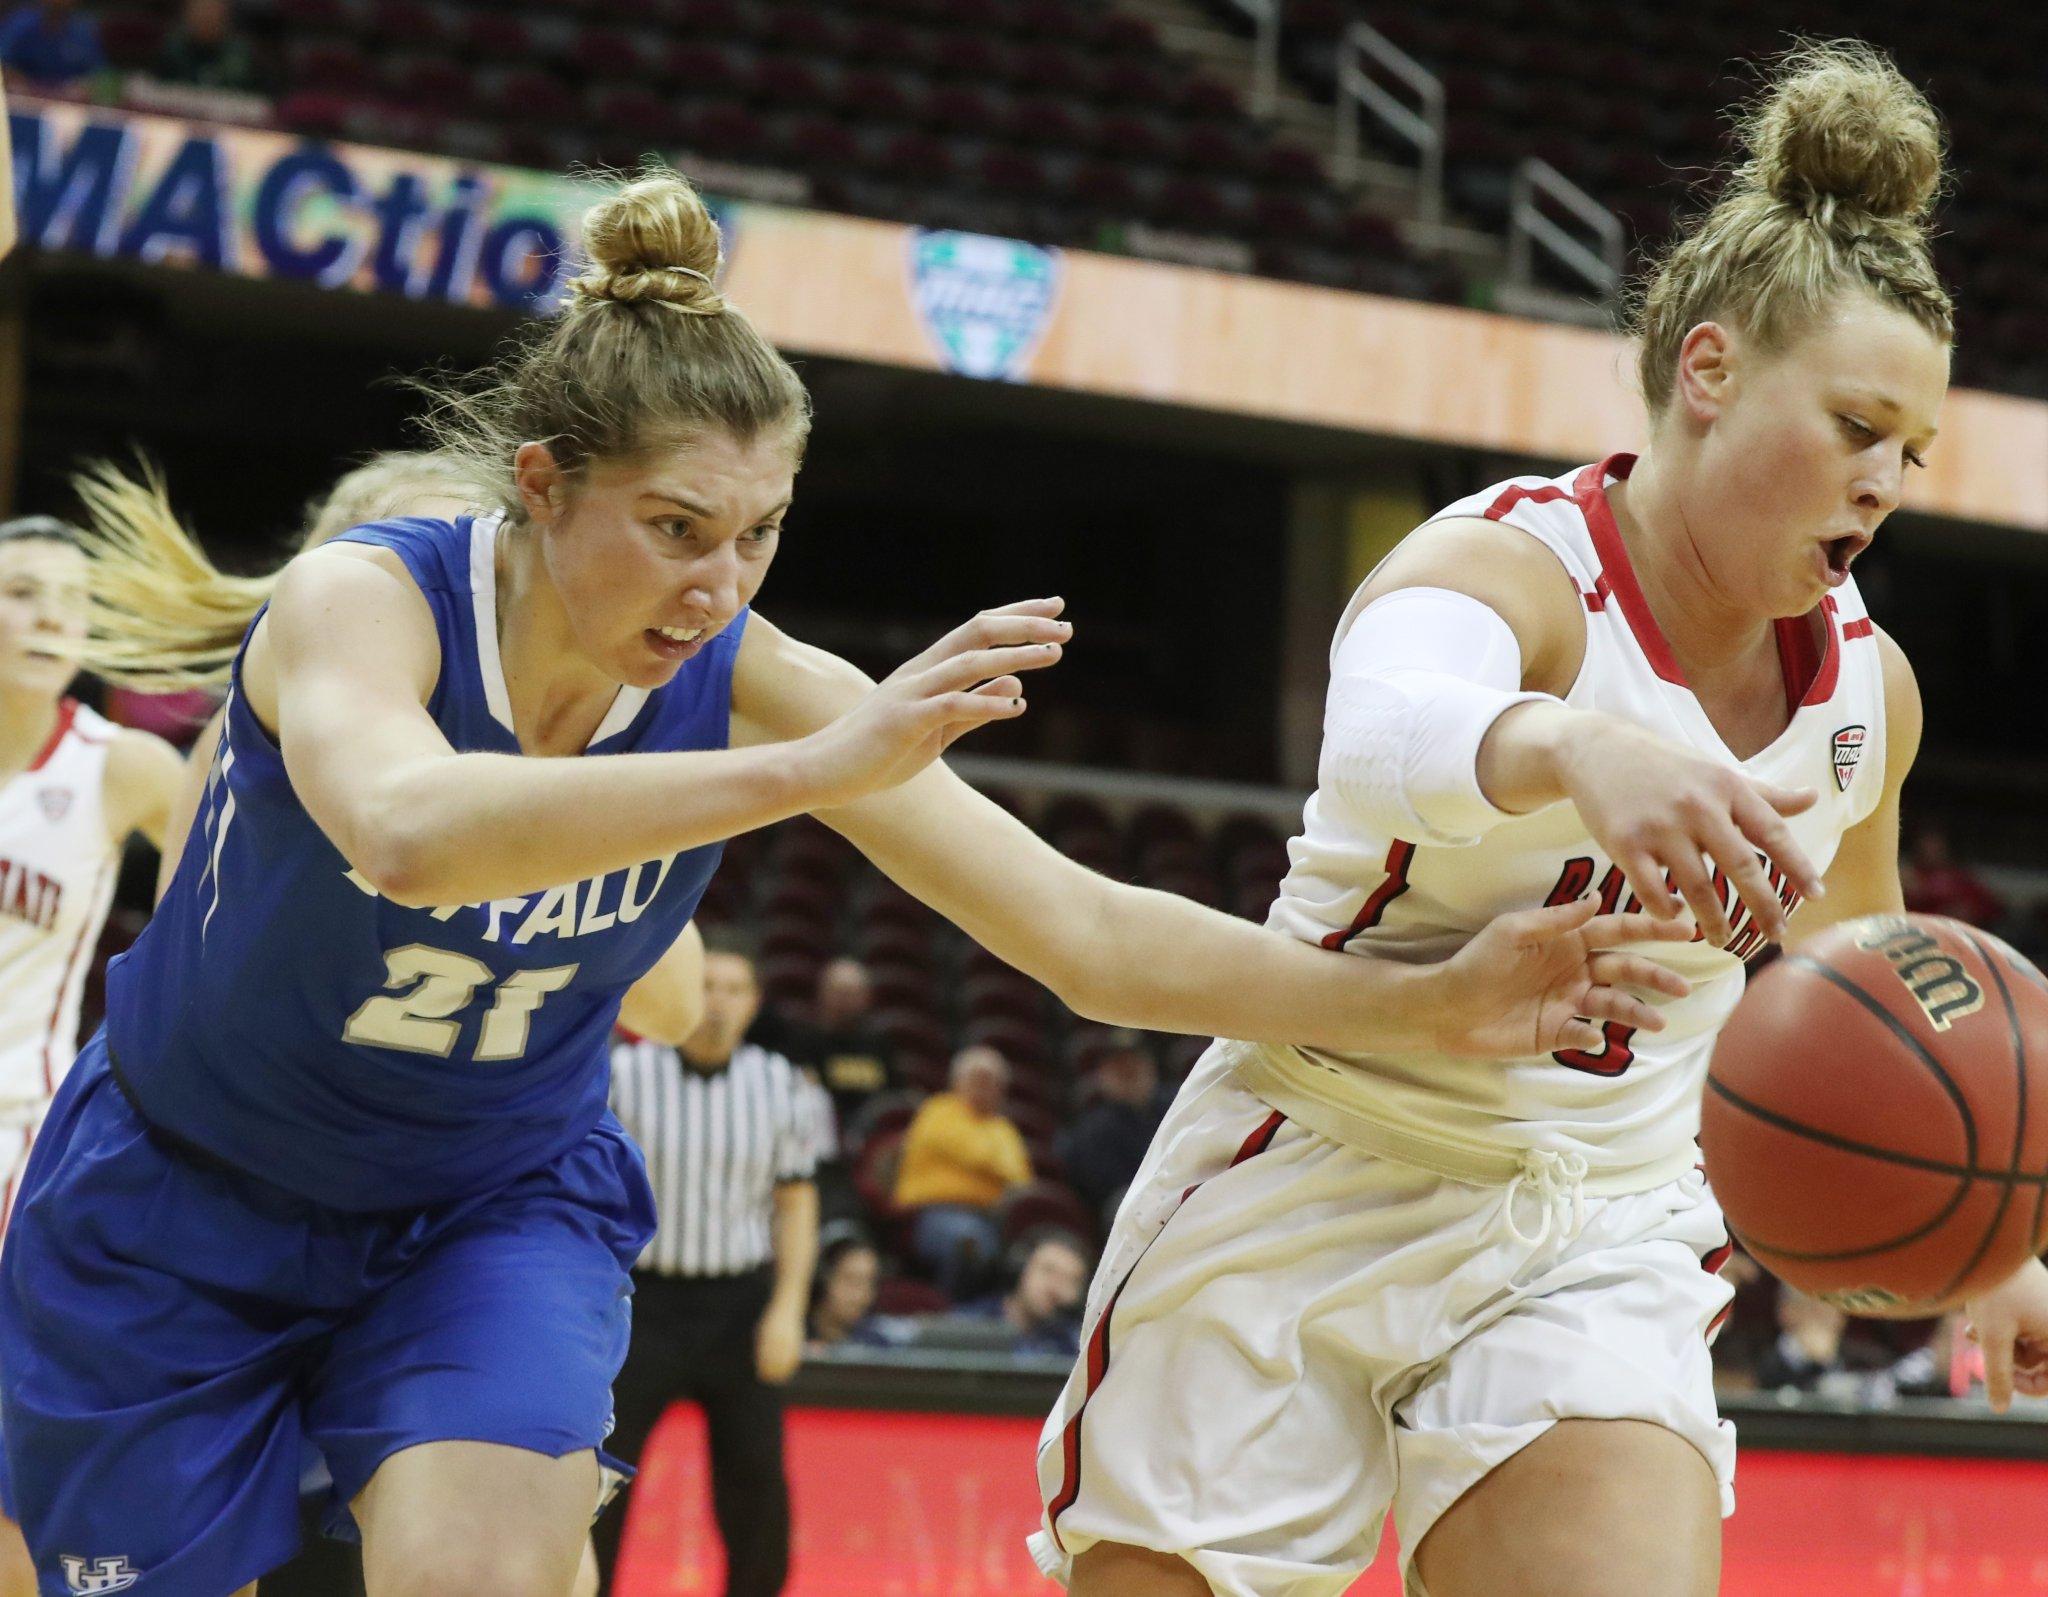 UB's Mariah Suchan battles for a rebound vs. Ball State. (James P. McCoy/Buffalo News)